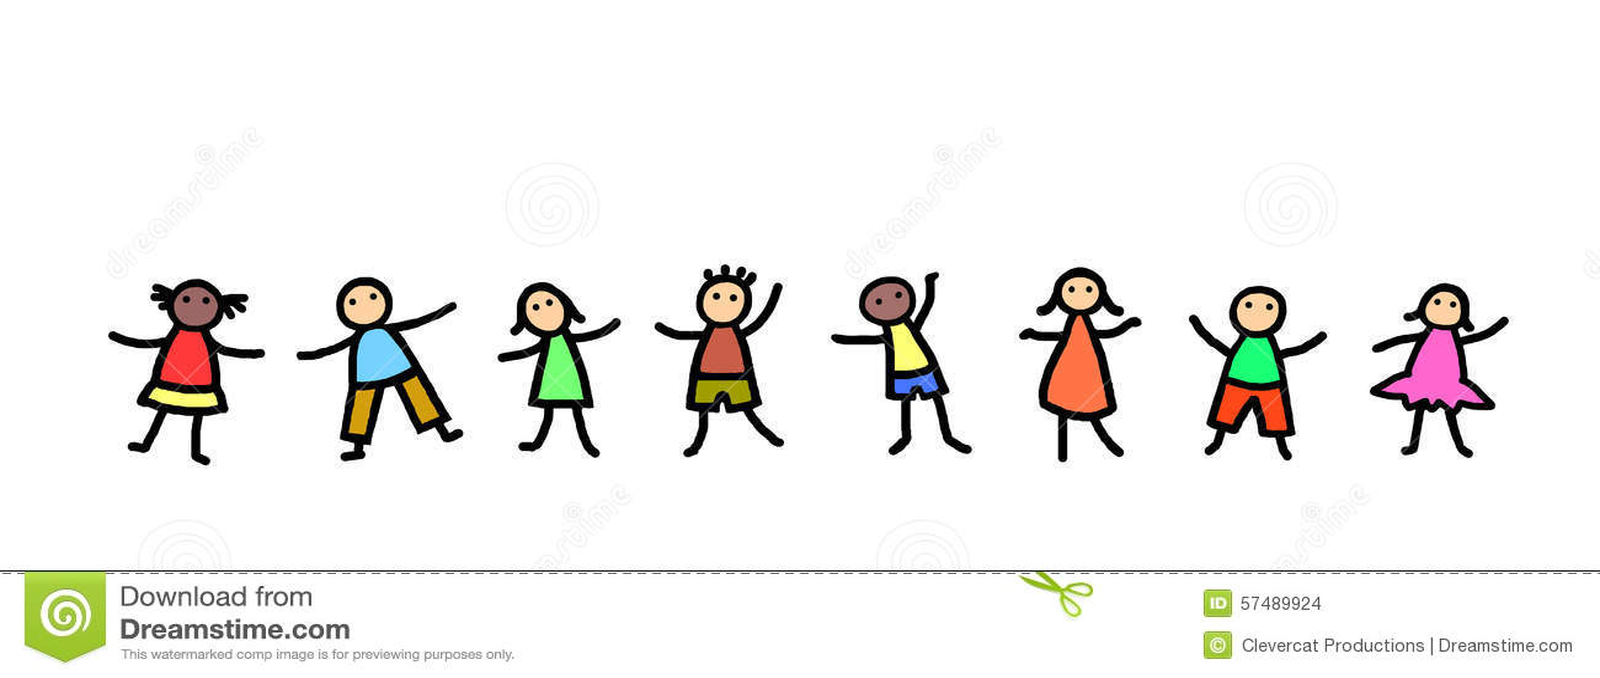 kids dancing illustration stock illustration image 57489924 Someone Dancing Party Clip Art